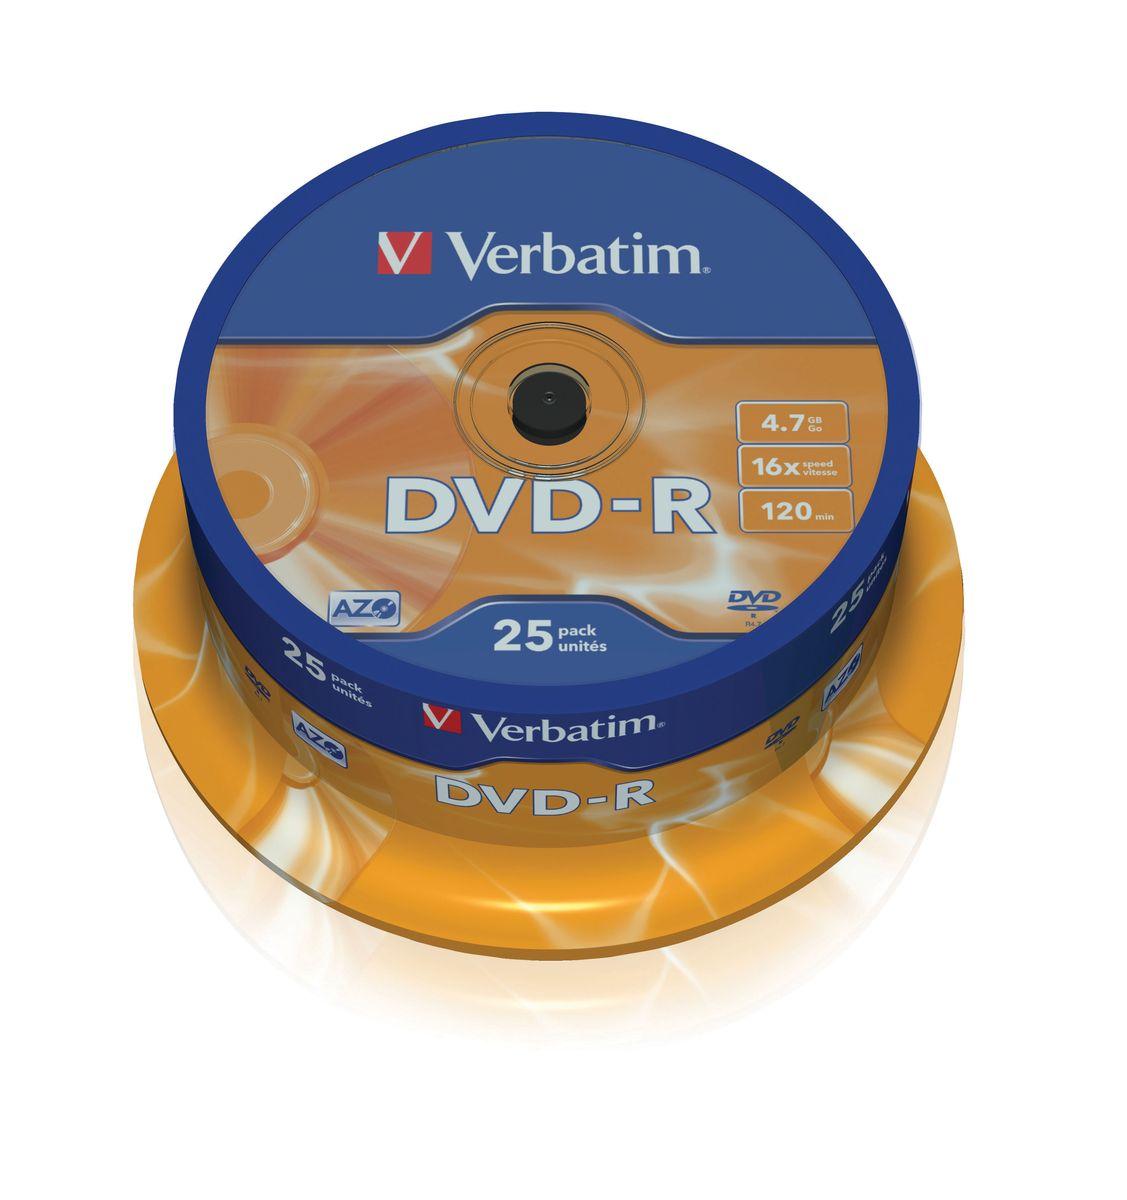 Verbatim DVD-R 4.7Gb 16x лазерный диск, 25 шт (Cake)